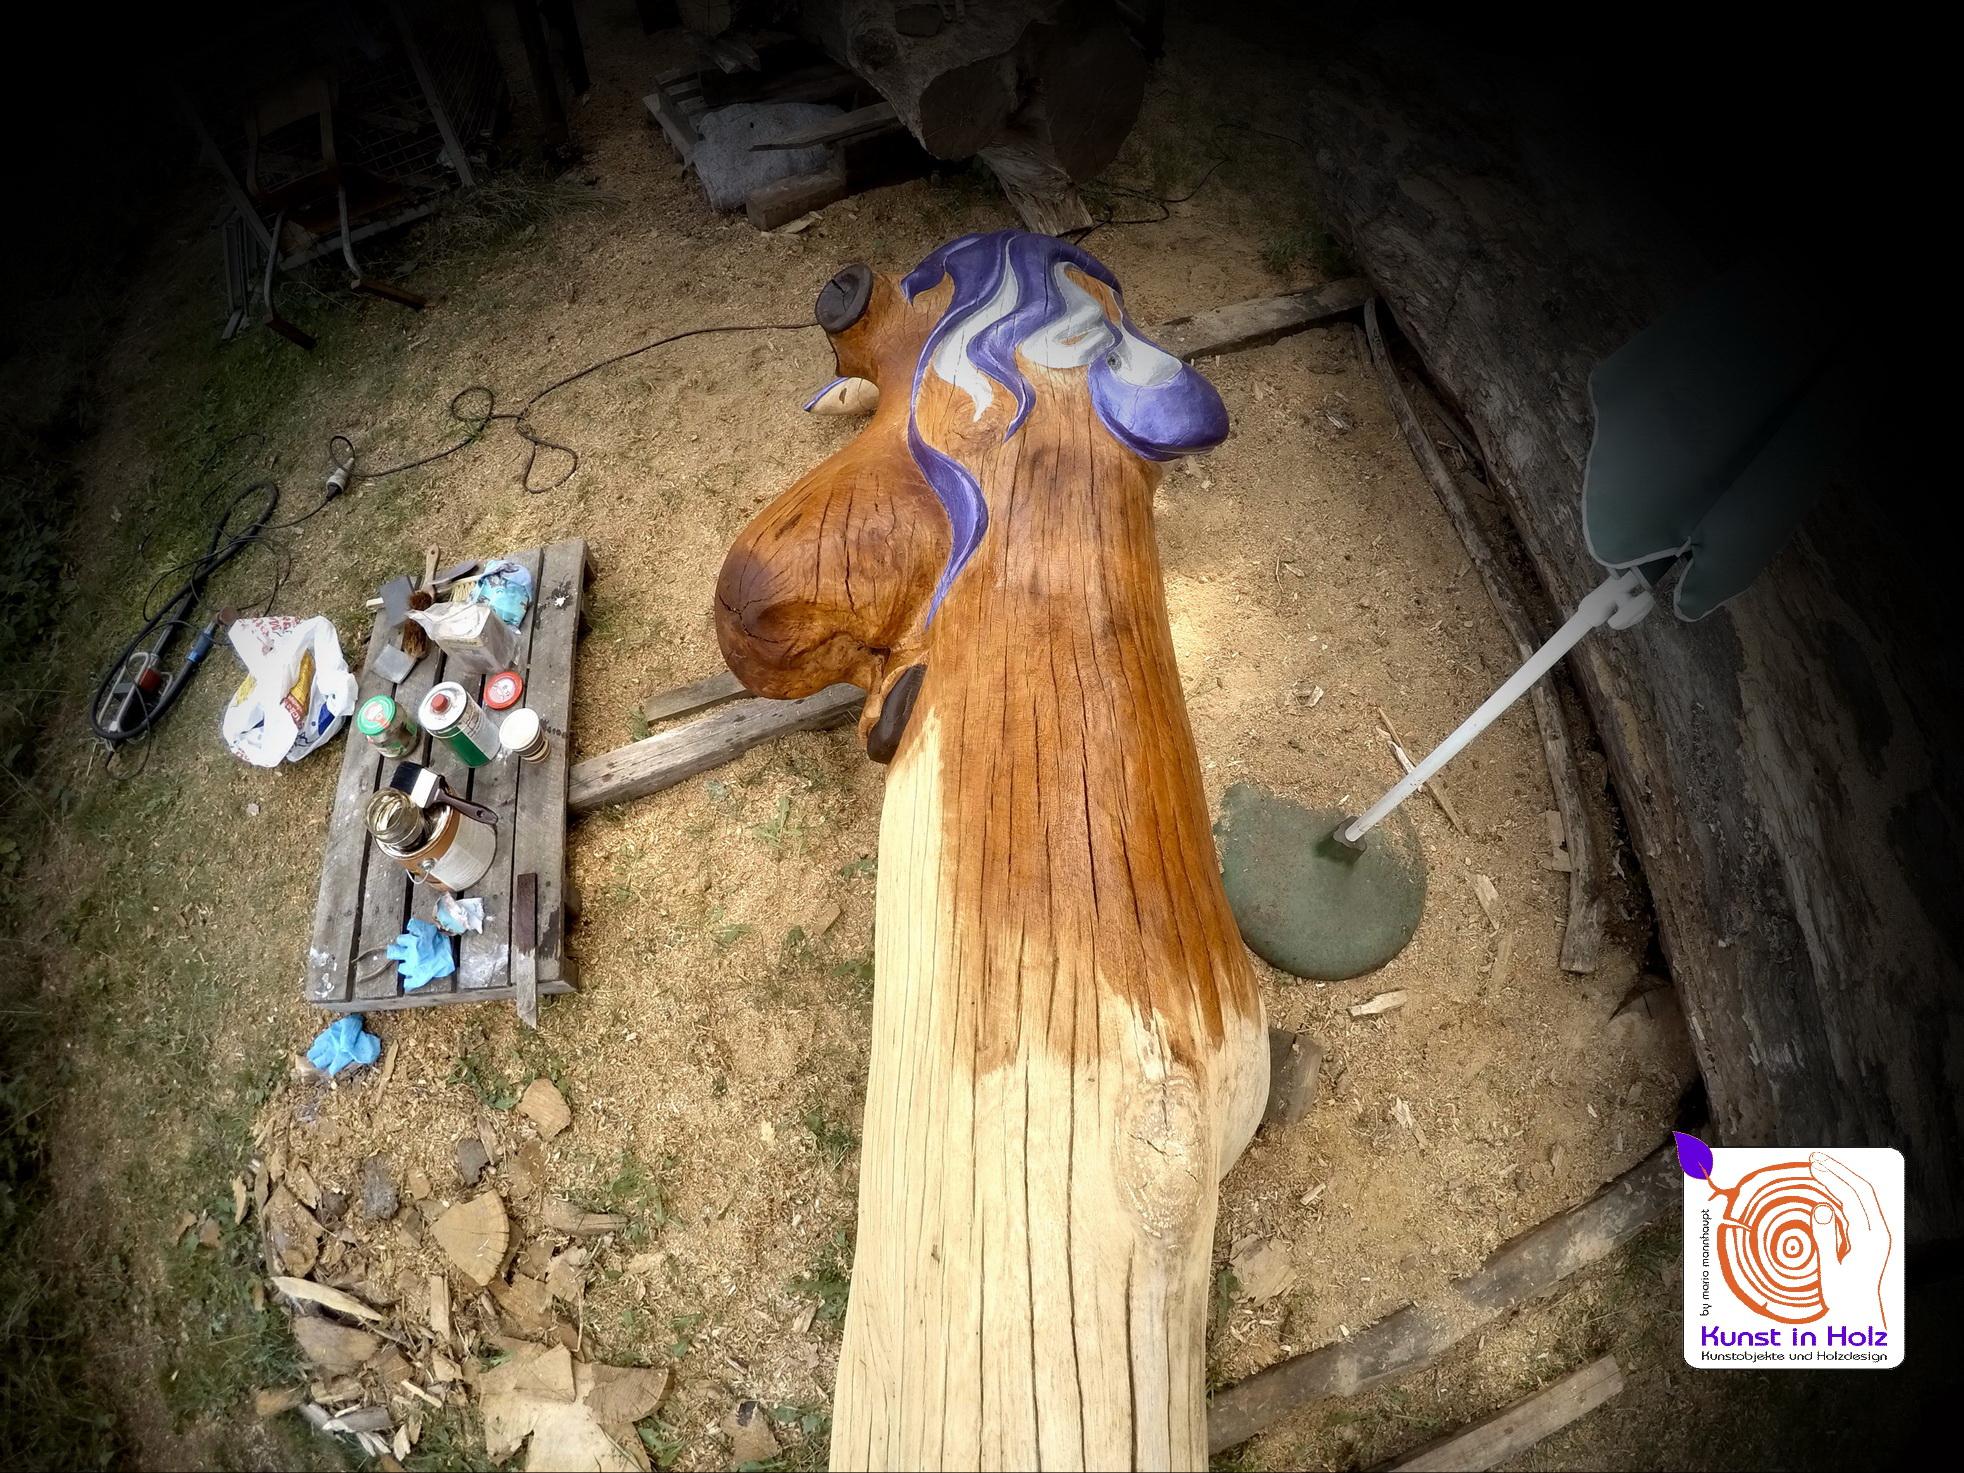 Holzkulptur mit lila Frisur - Desingn by Mario Mannhaupt